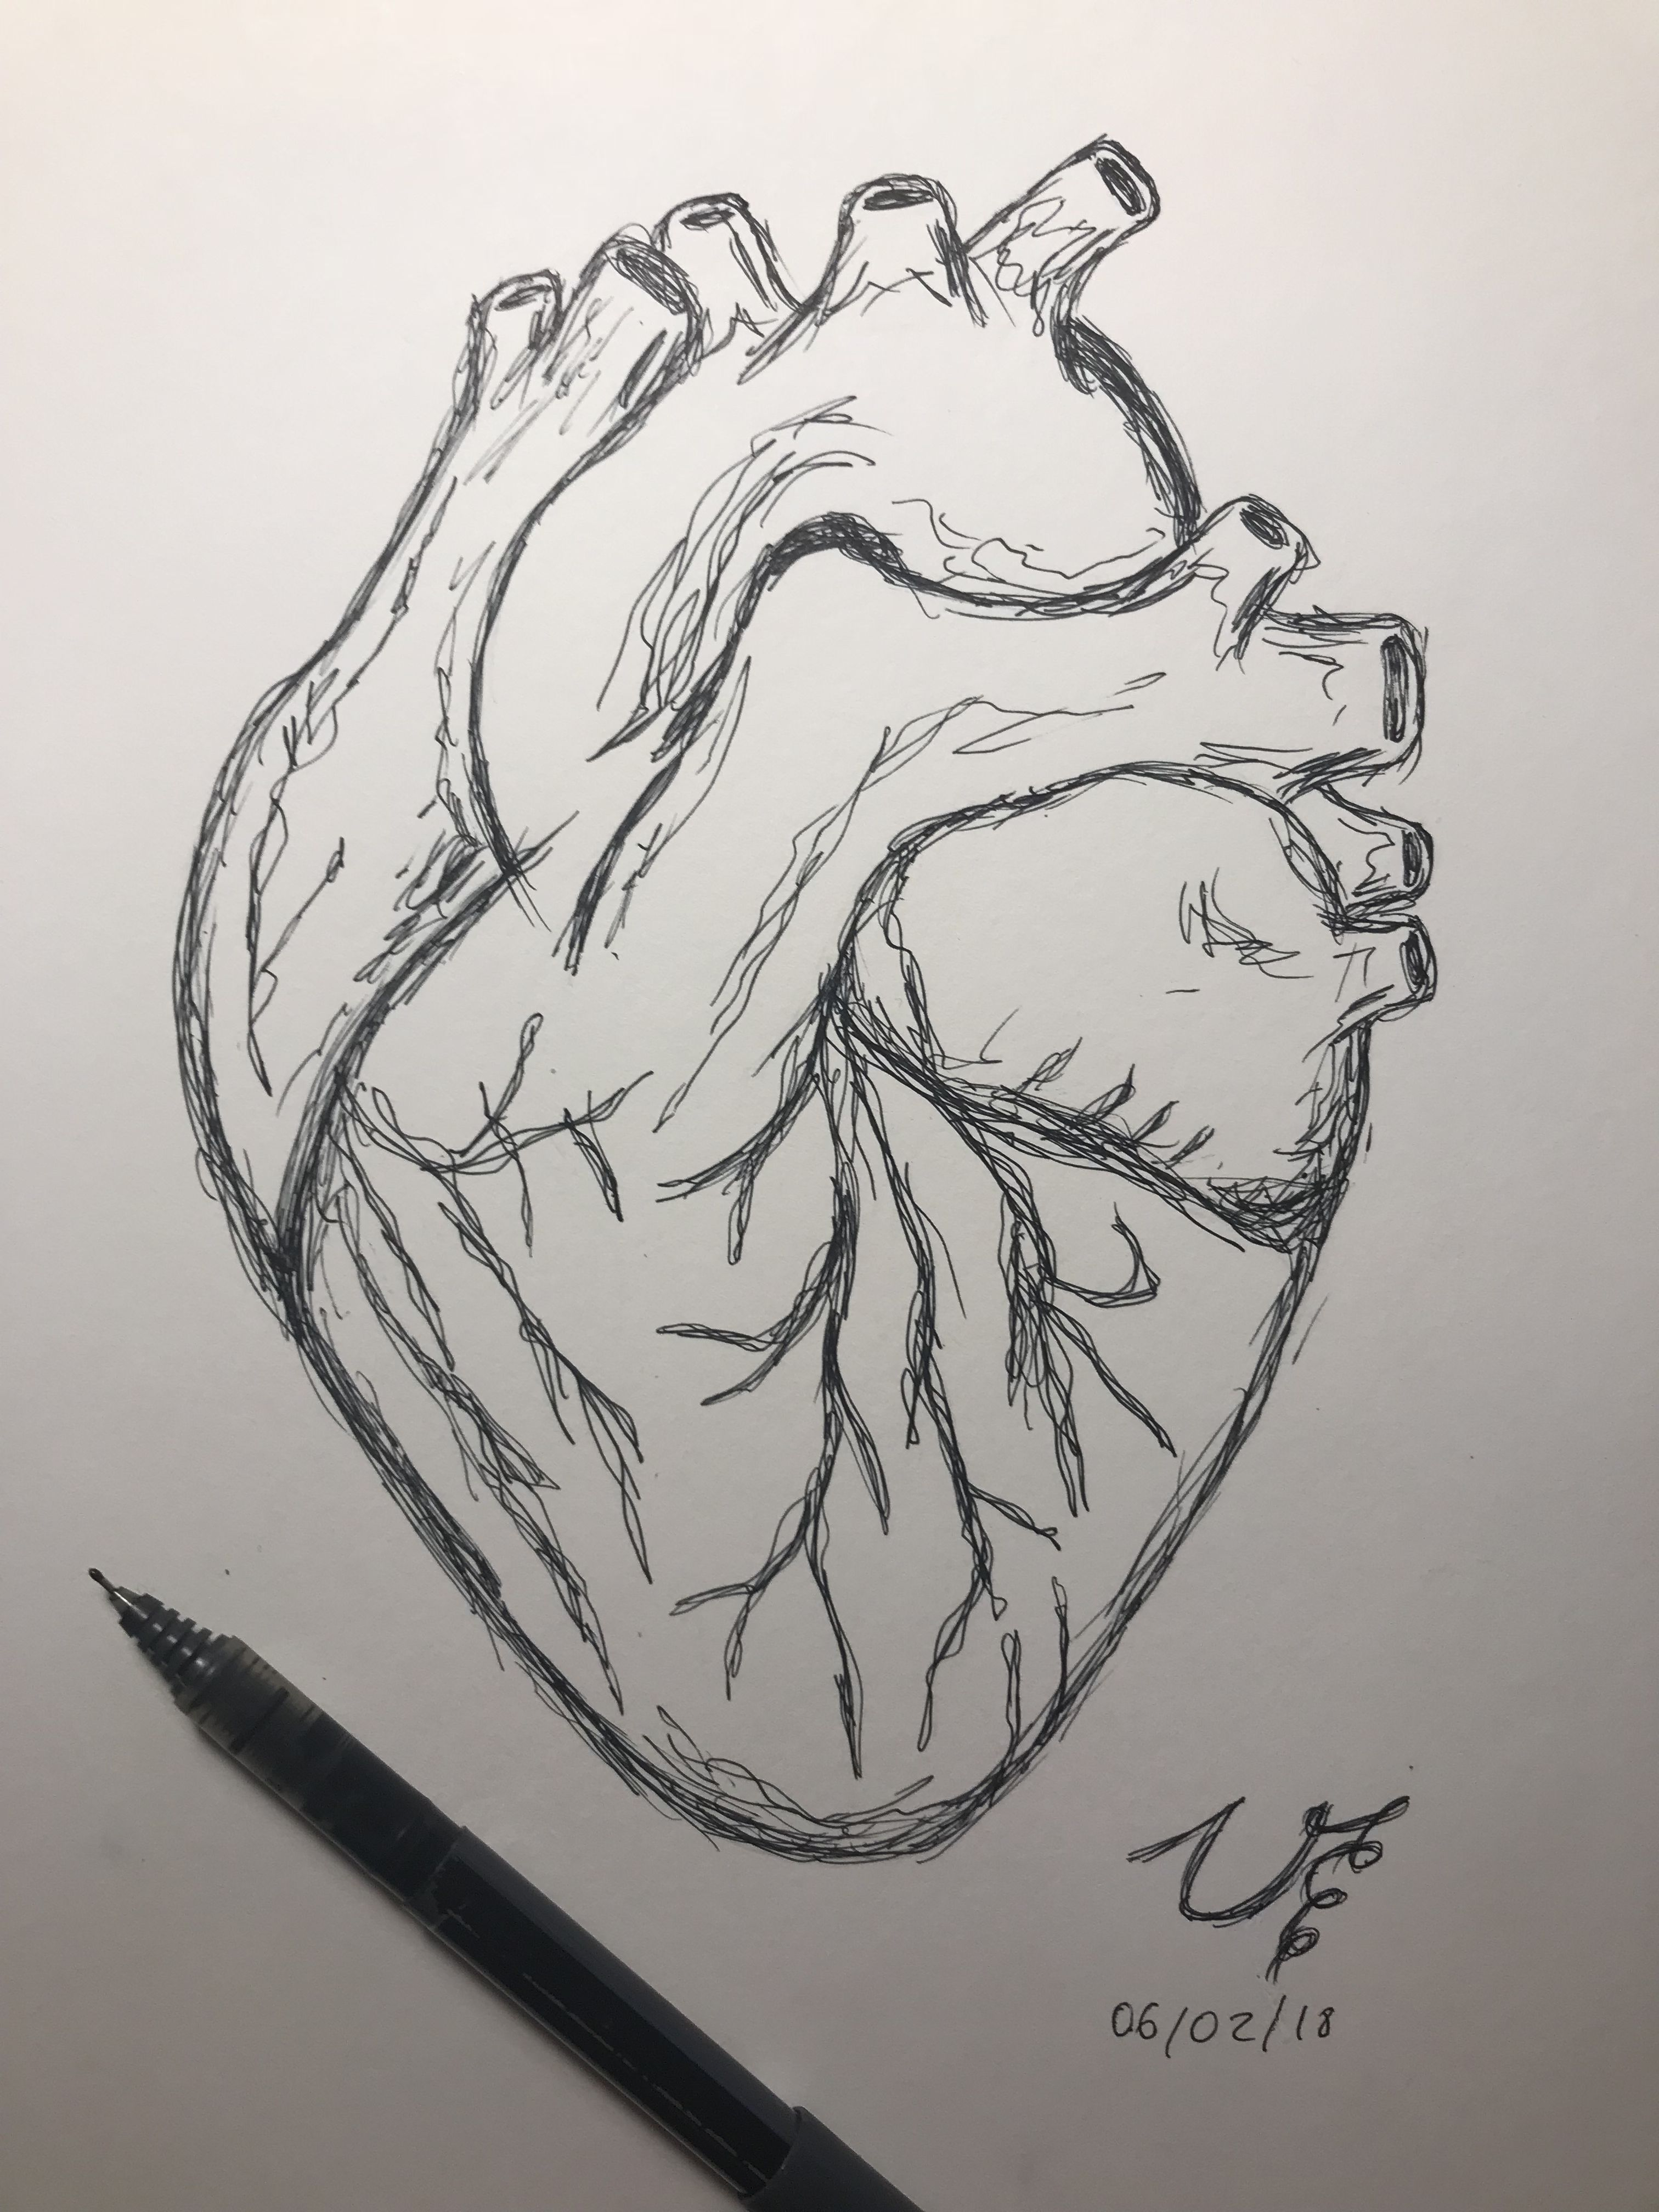 Human heart drawing sketchs in 2019 drawings human heart